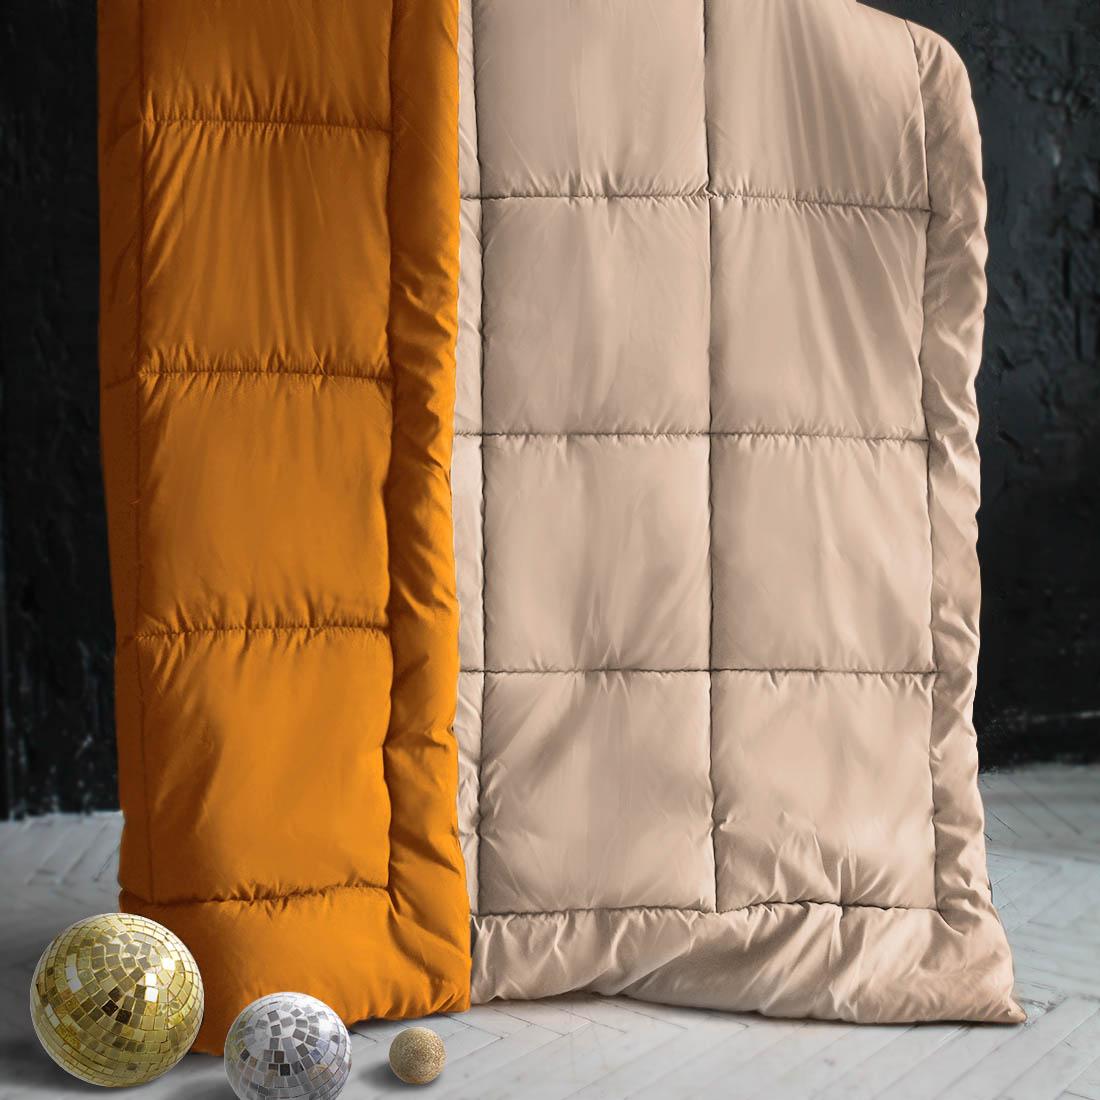 Одеяла Sleep iX Одеяло MiltiColorЦвет: Оранжевый/Бежевый (140х205 см) одеяло лэмби цвет бежевый 140 х 205 см